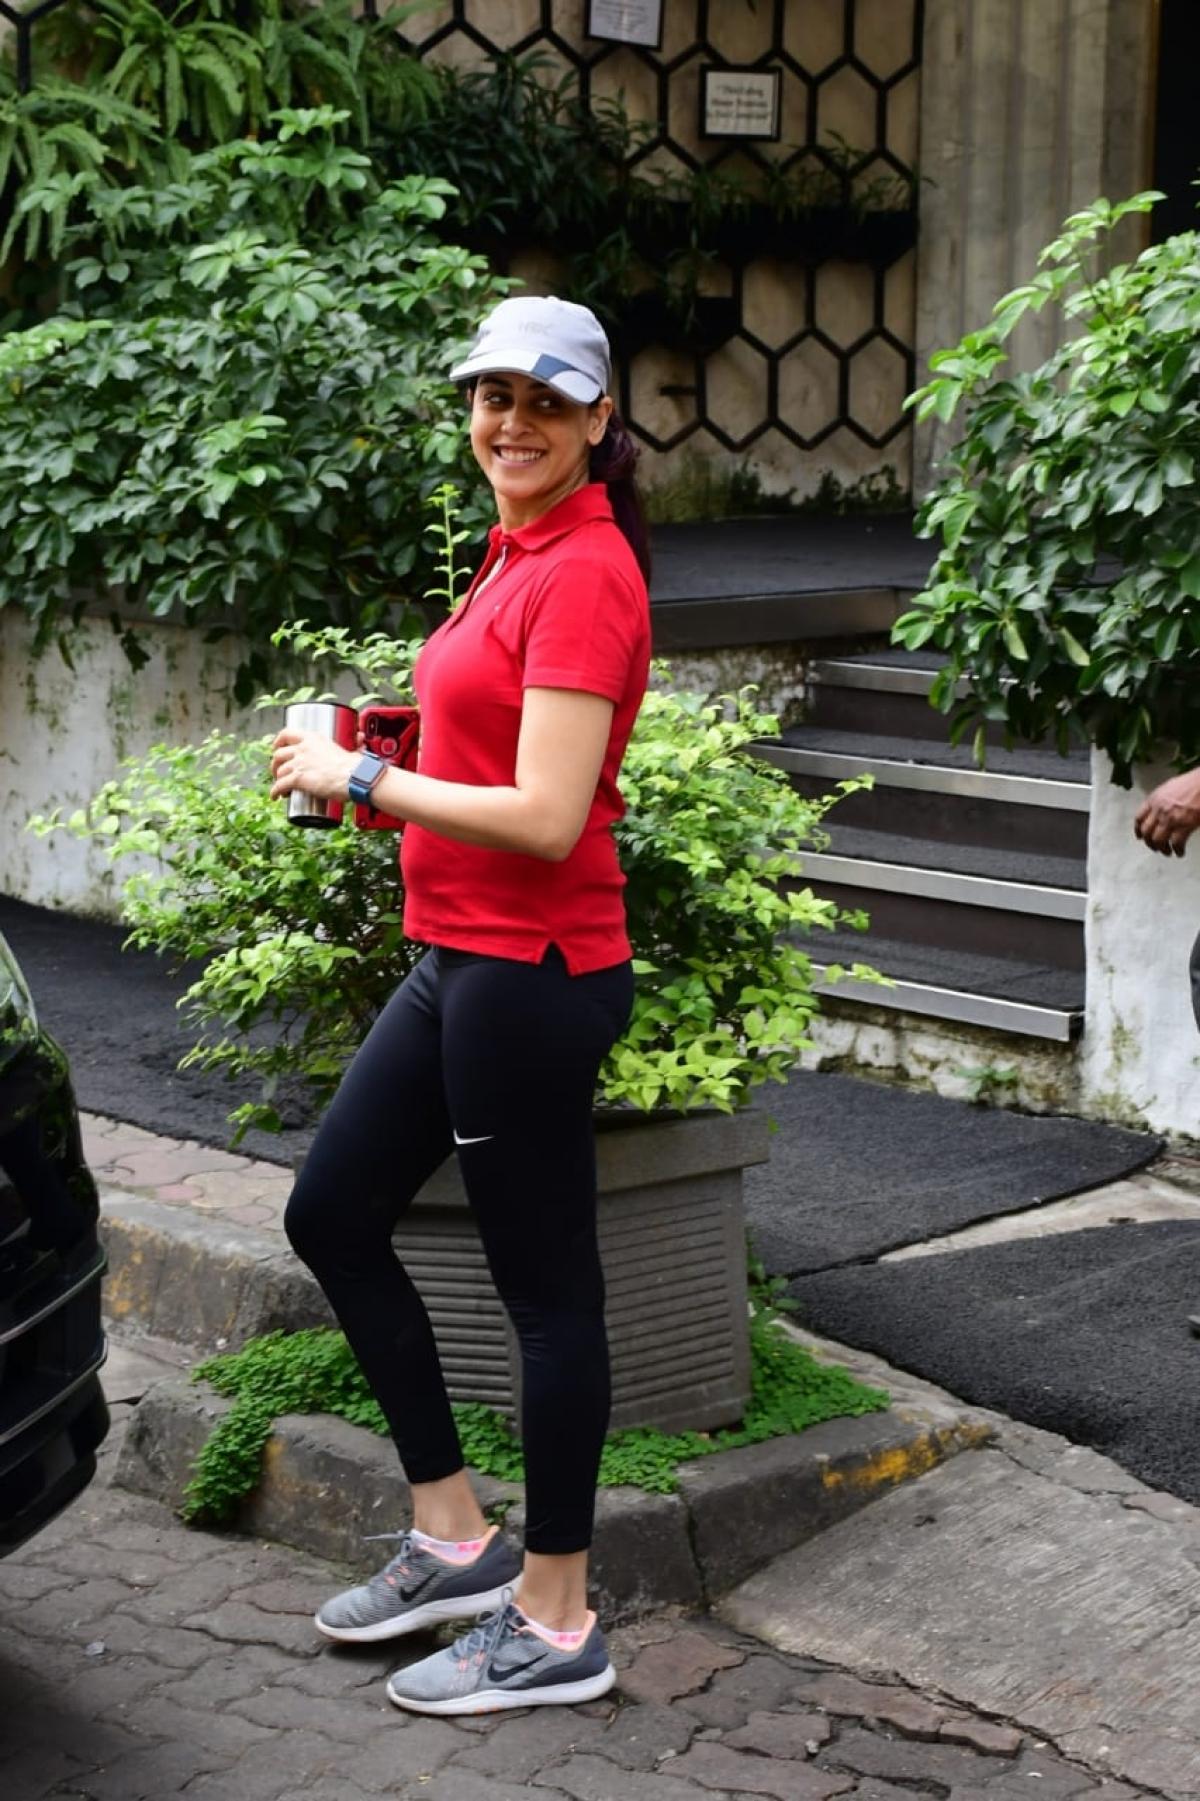 Genelia Deshmukh at gym